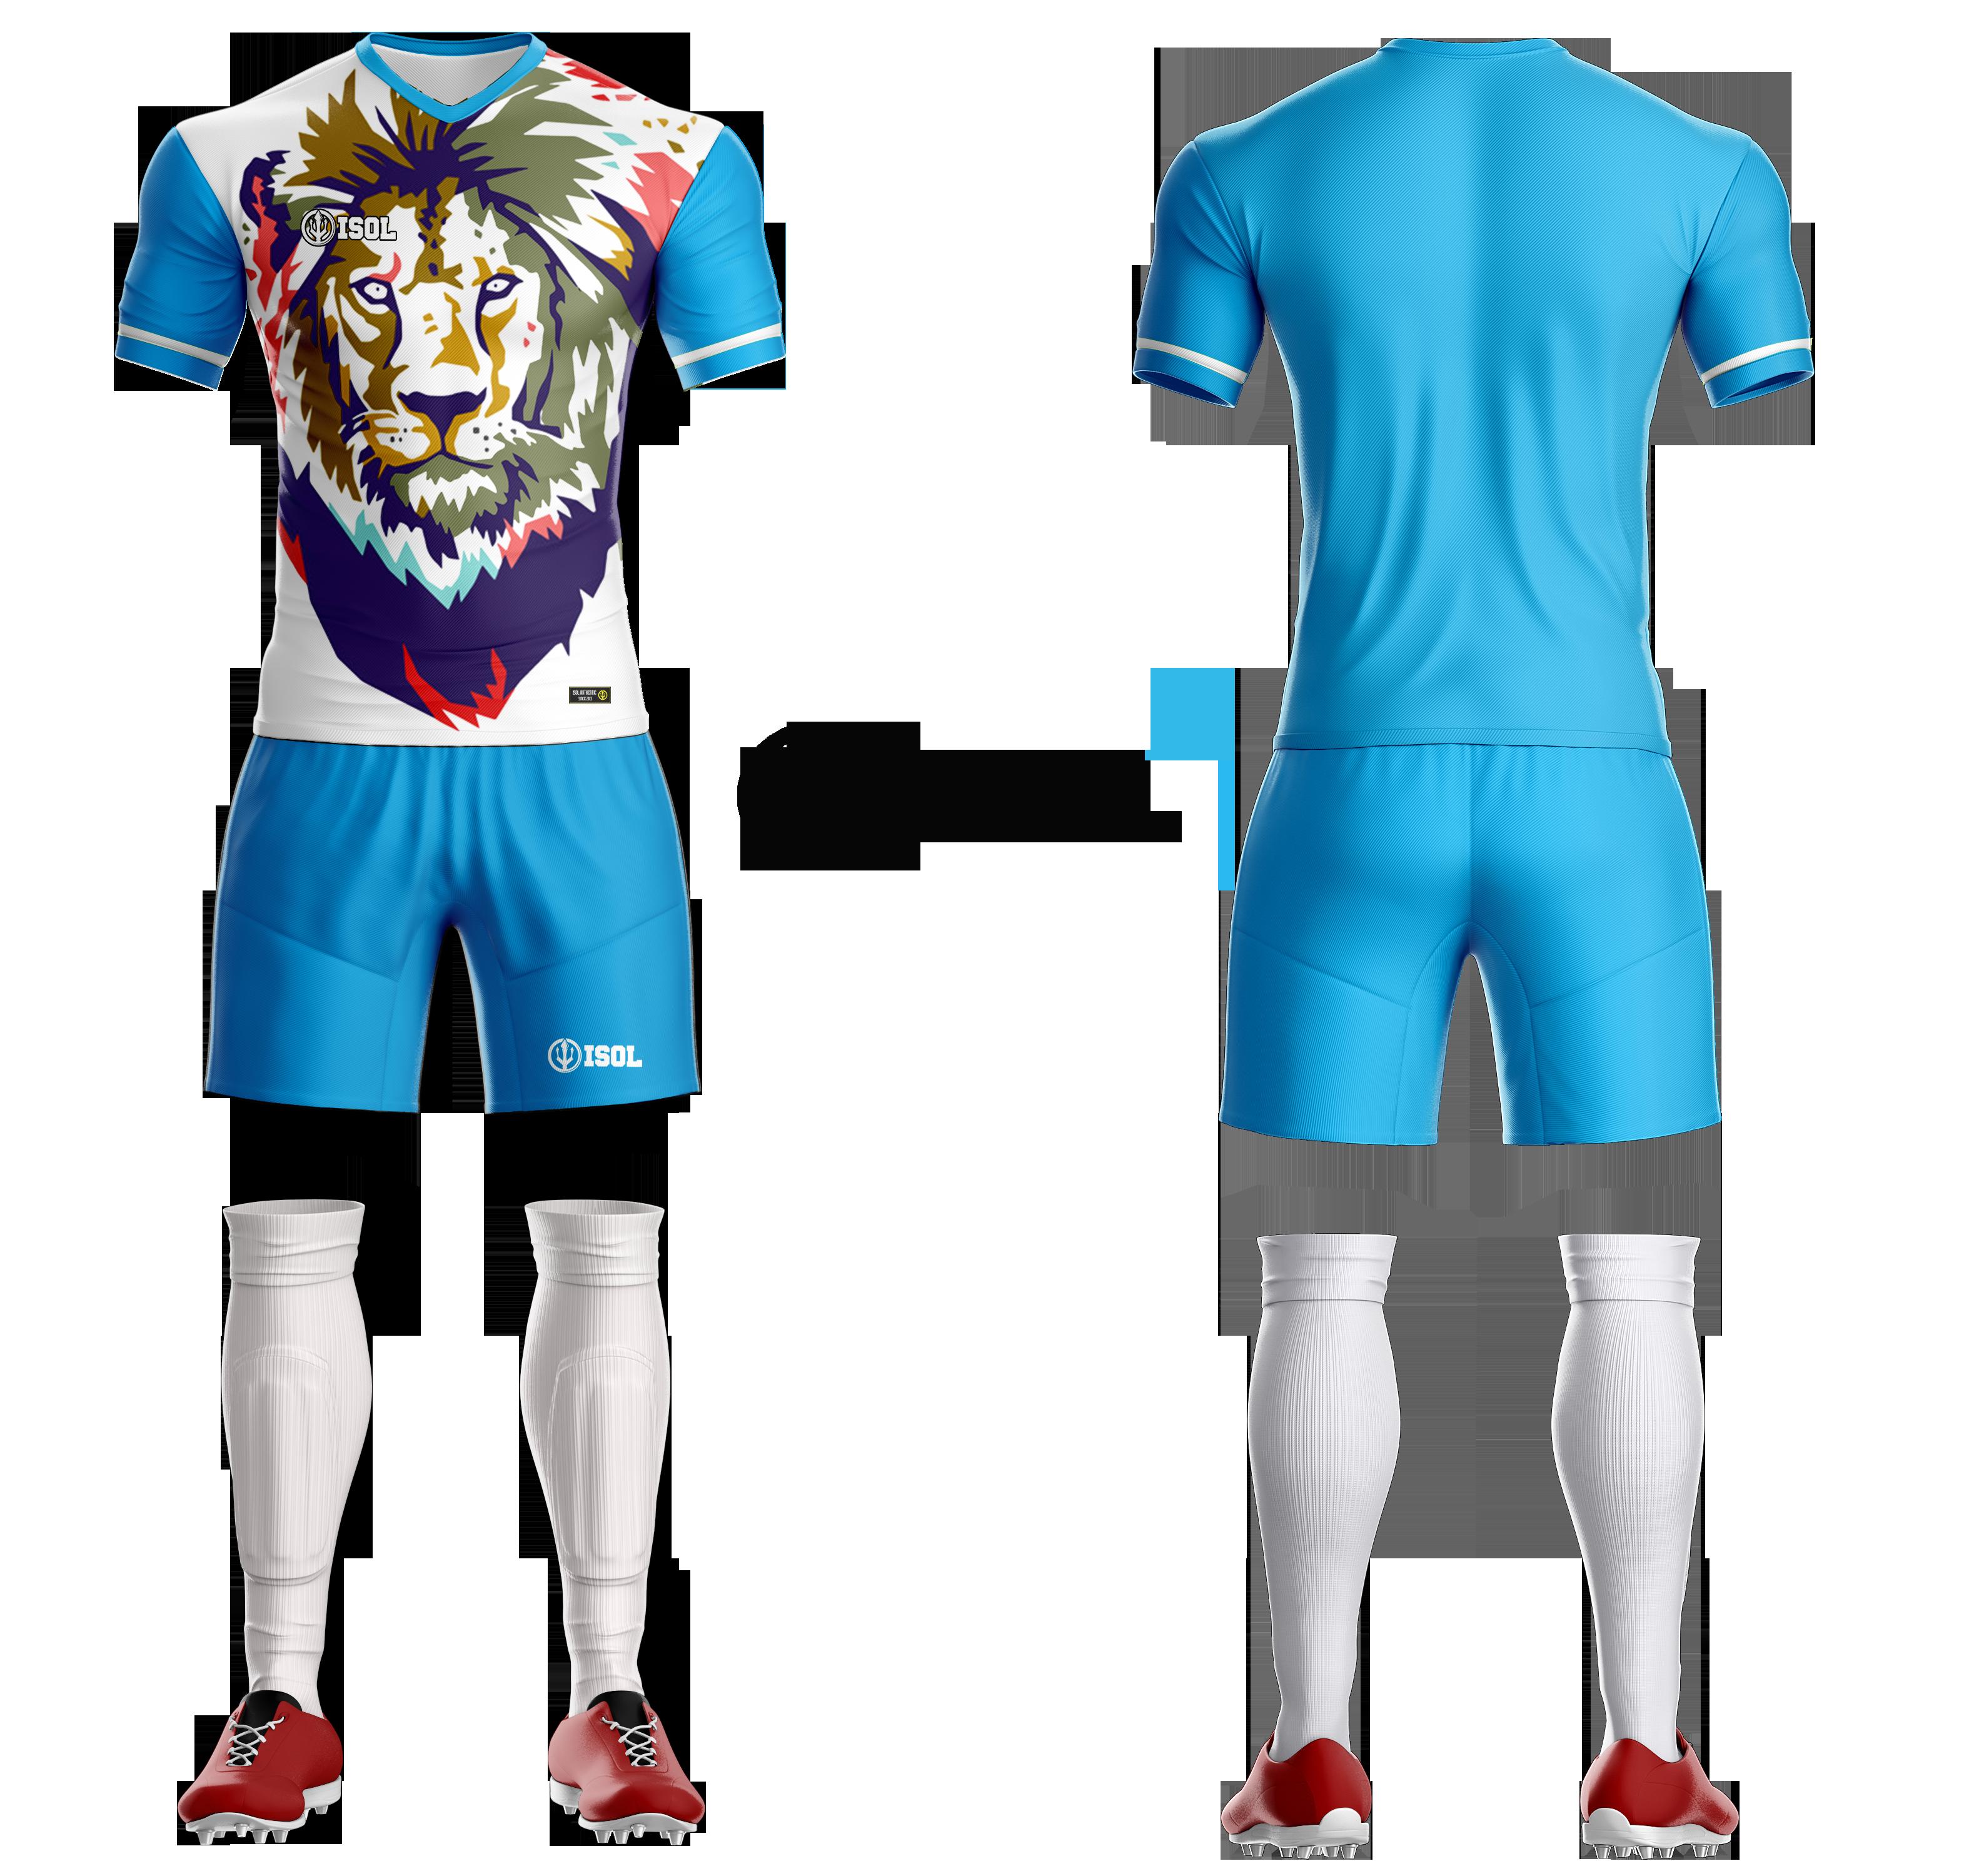 Desain Baju Bola Polos